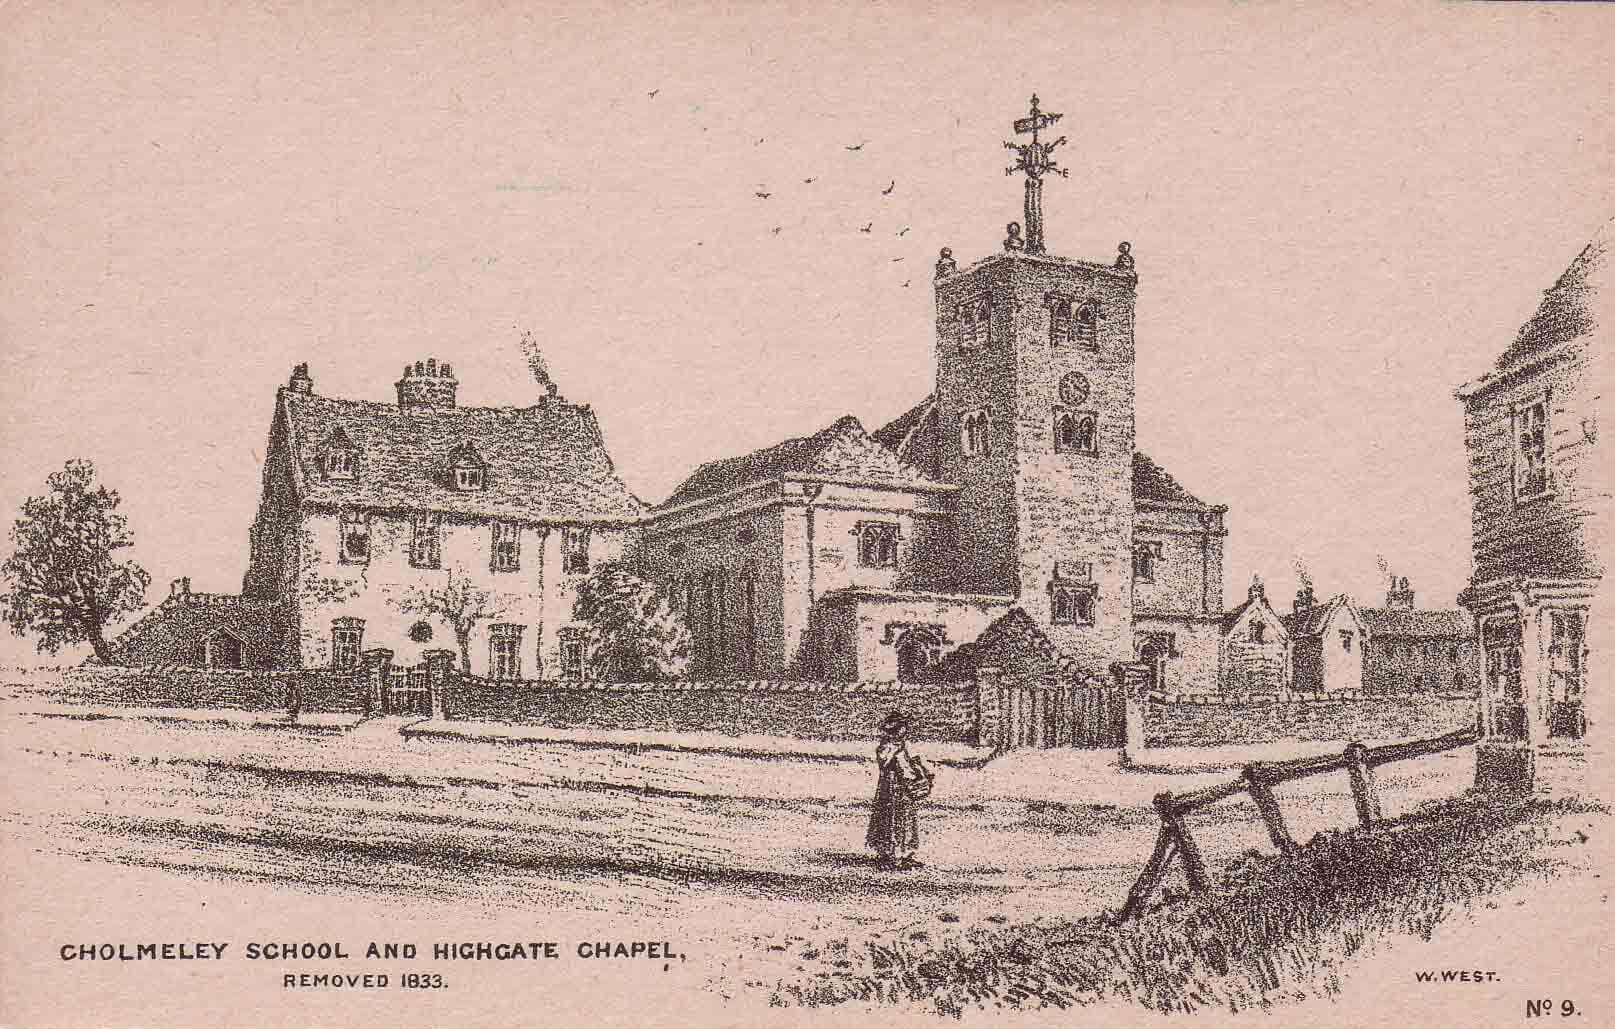 Highgate School chapel, William West redrawing of old print